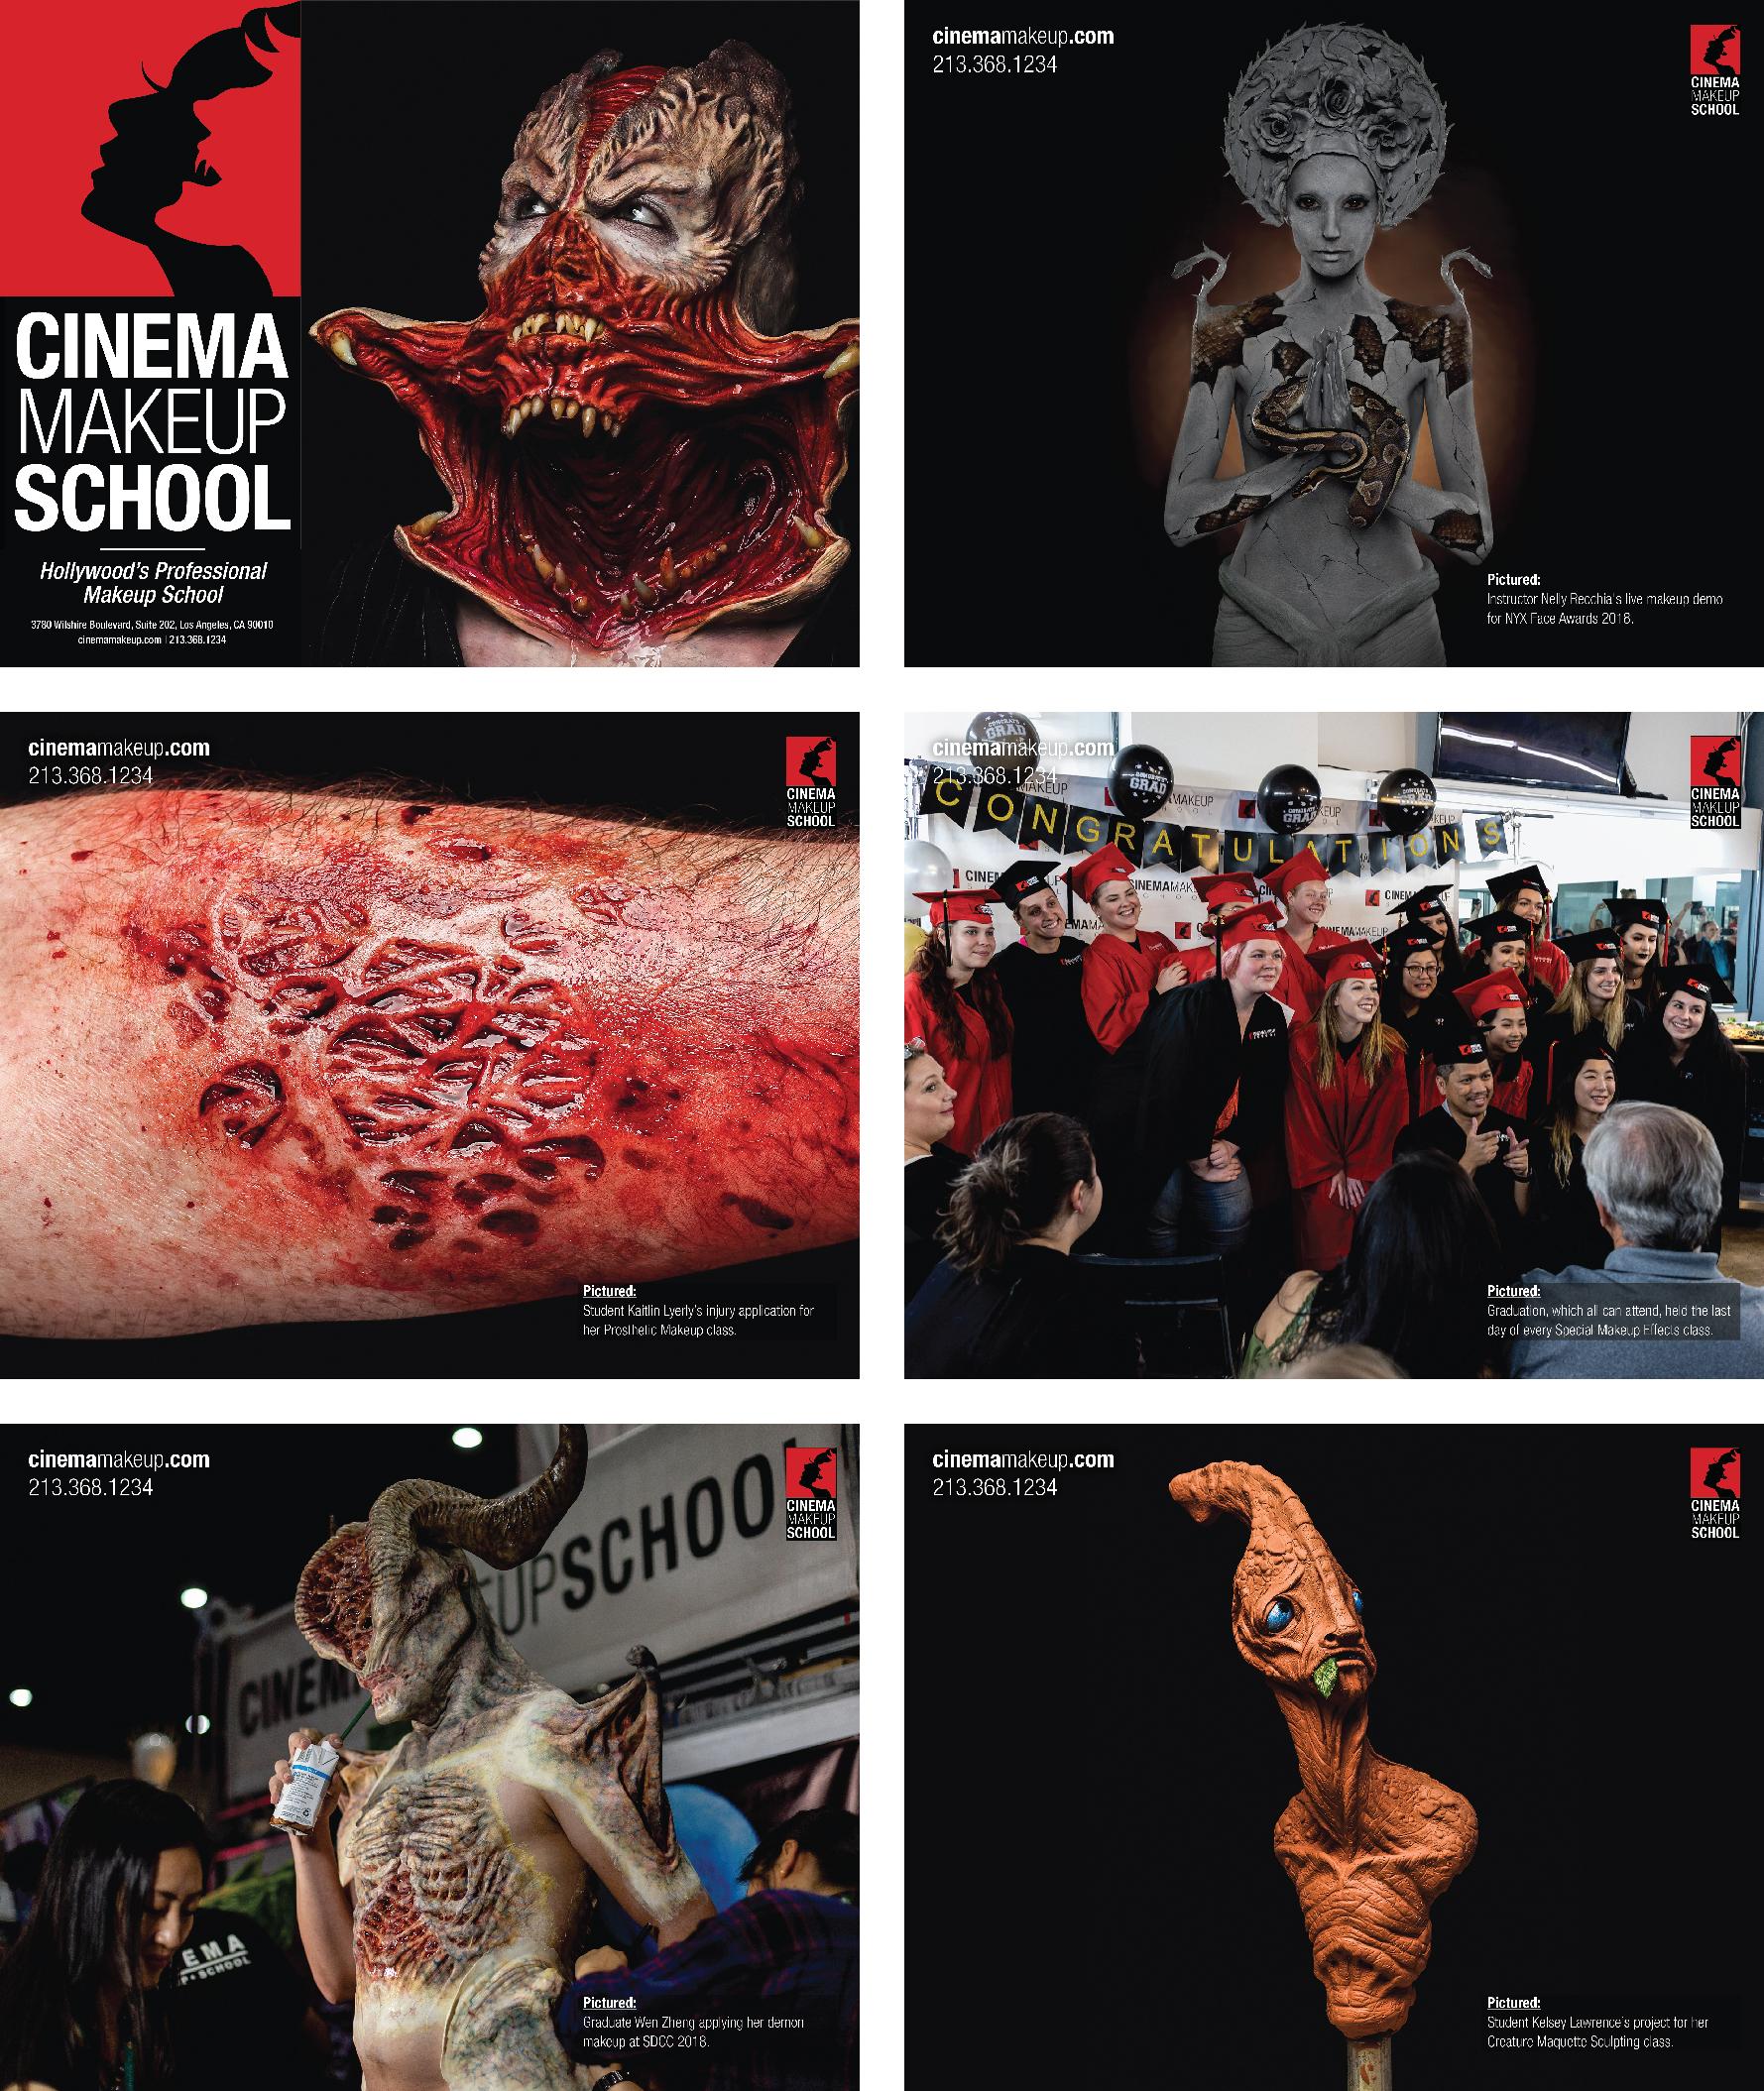 Cinema Makeup School Calendar Sample Images